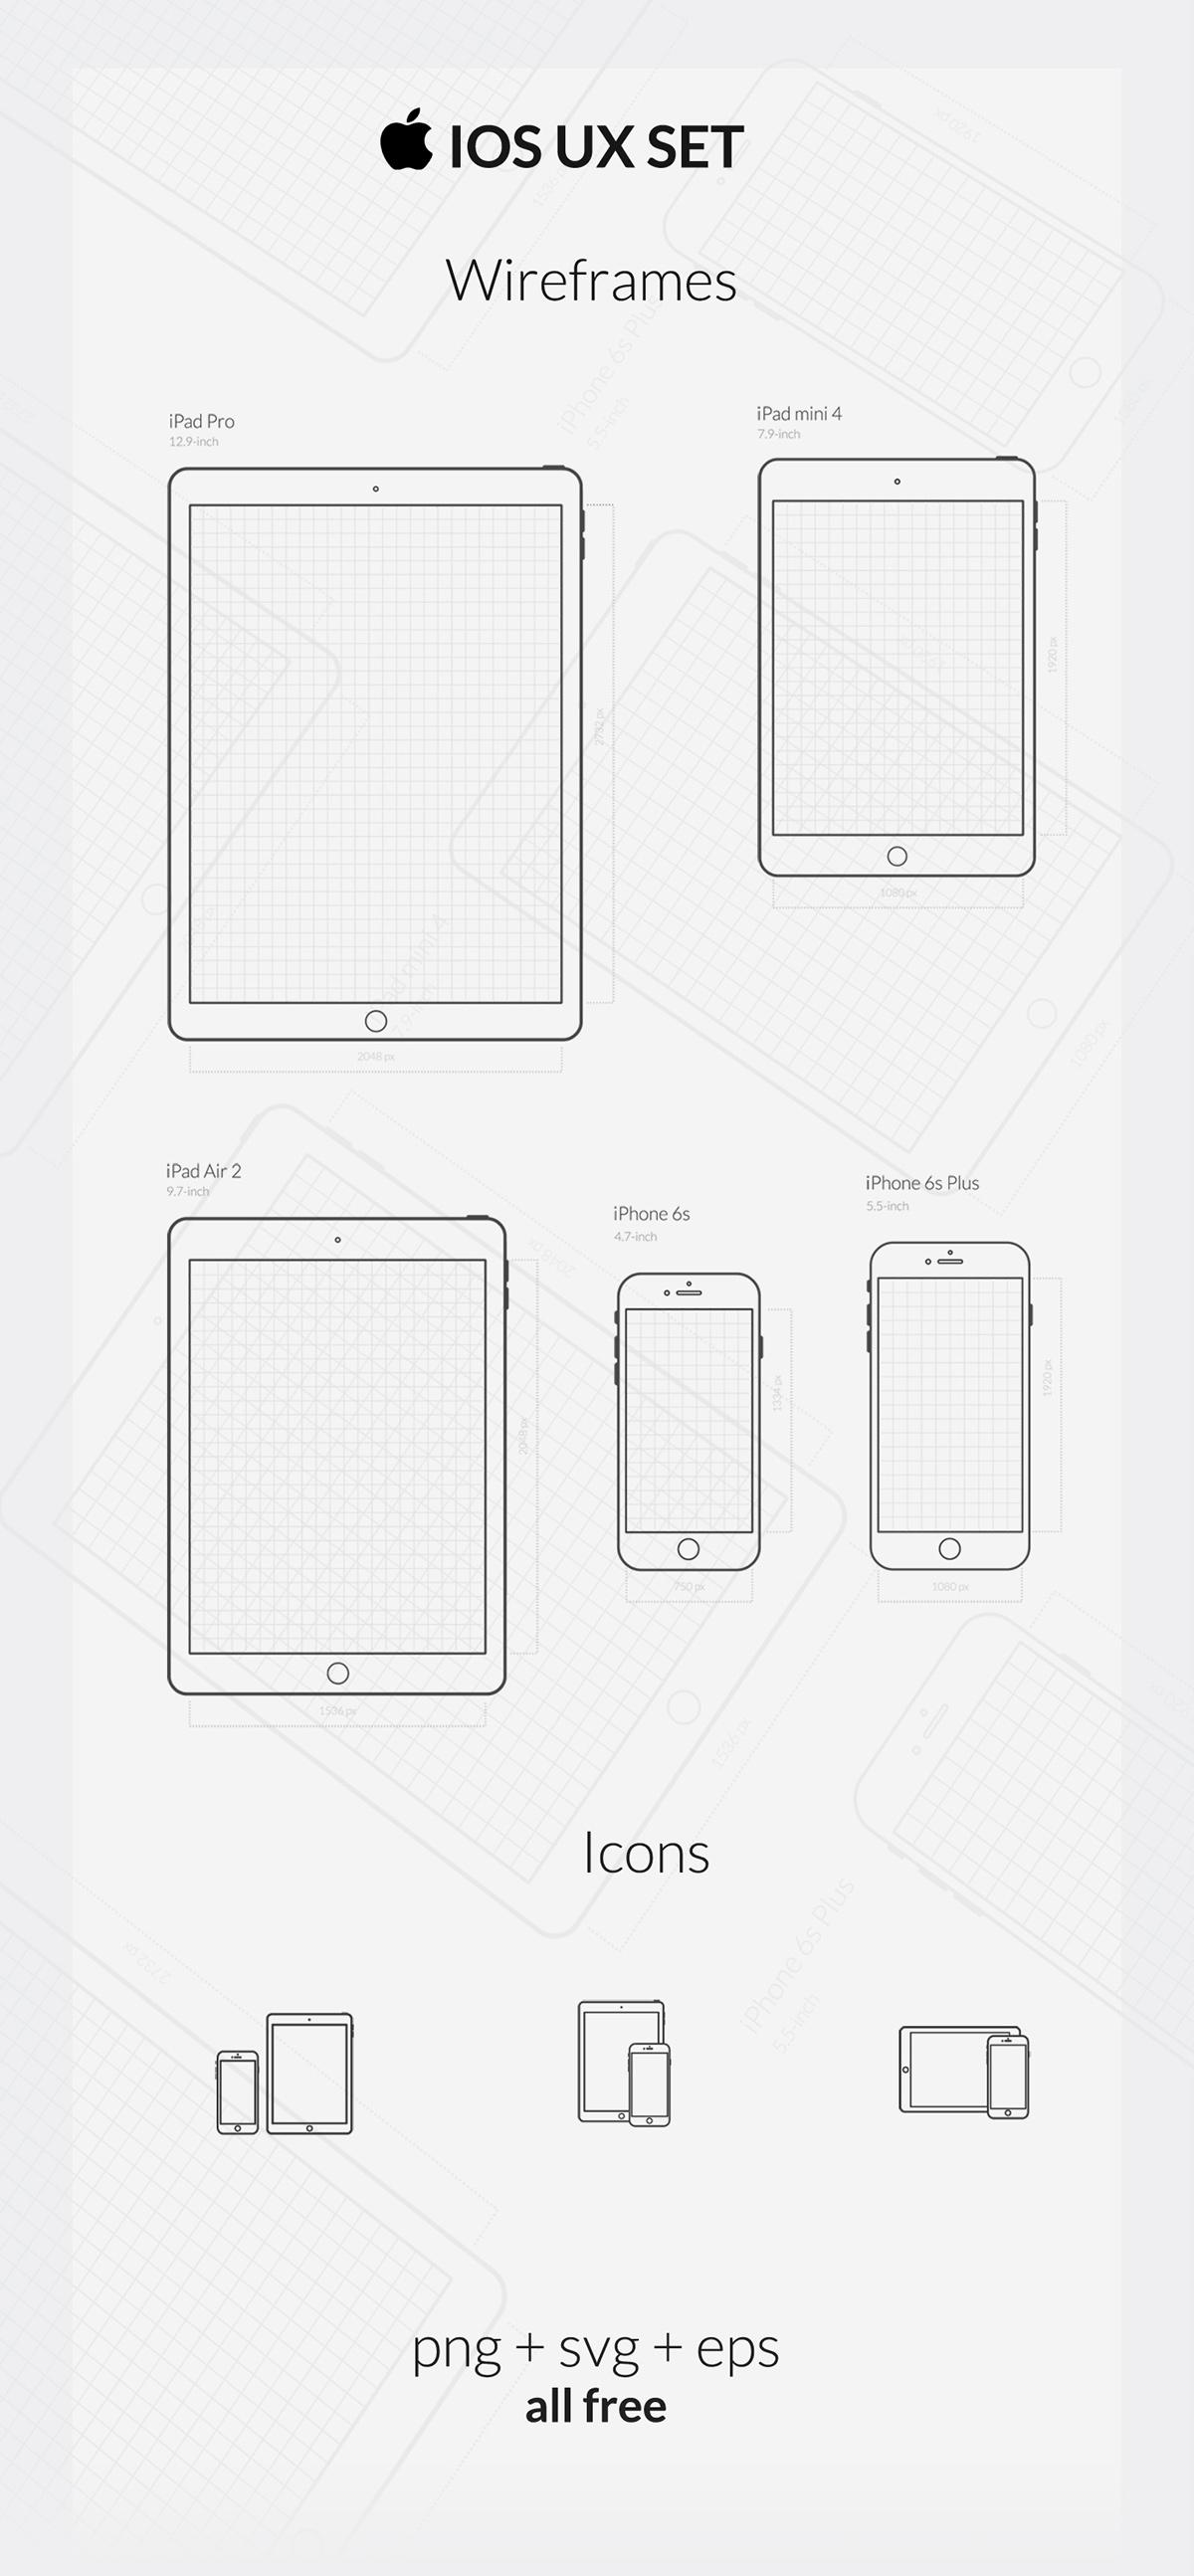 Free Ios Ux Set Wireframes Amp Icons On Behance